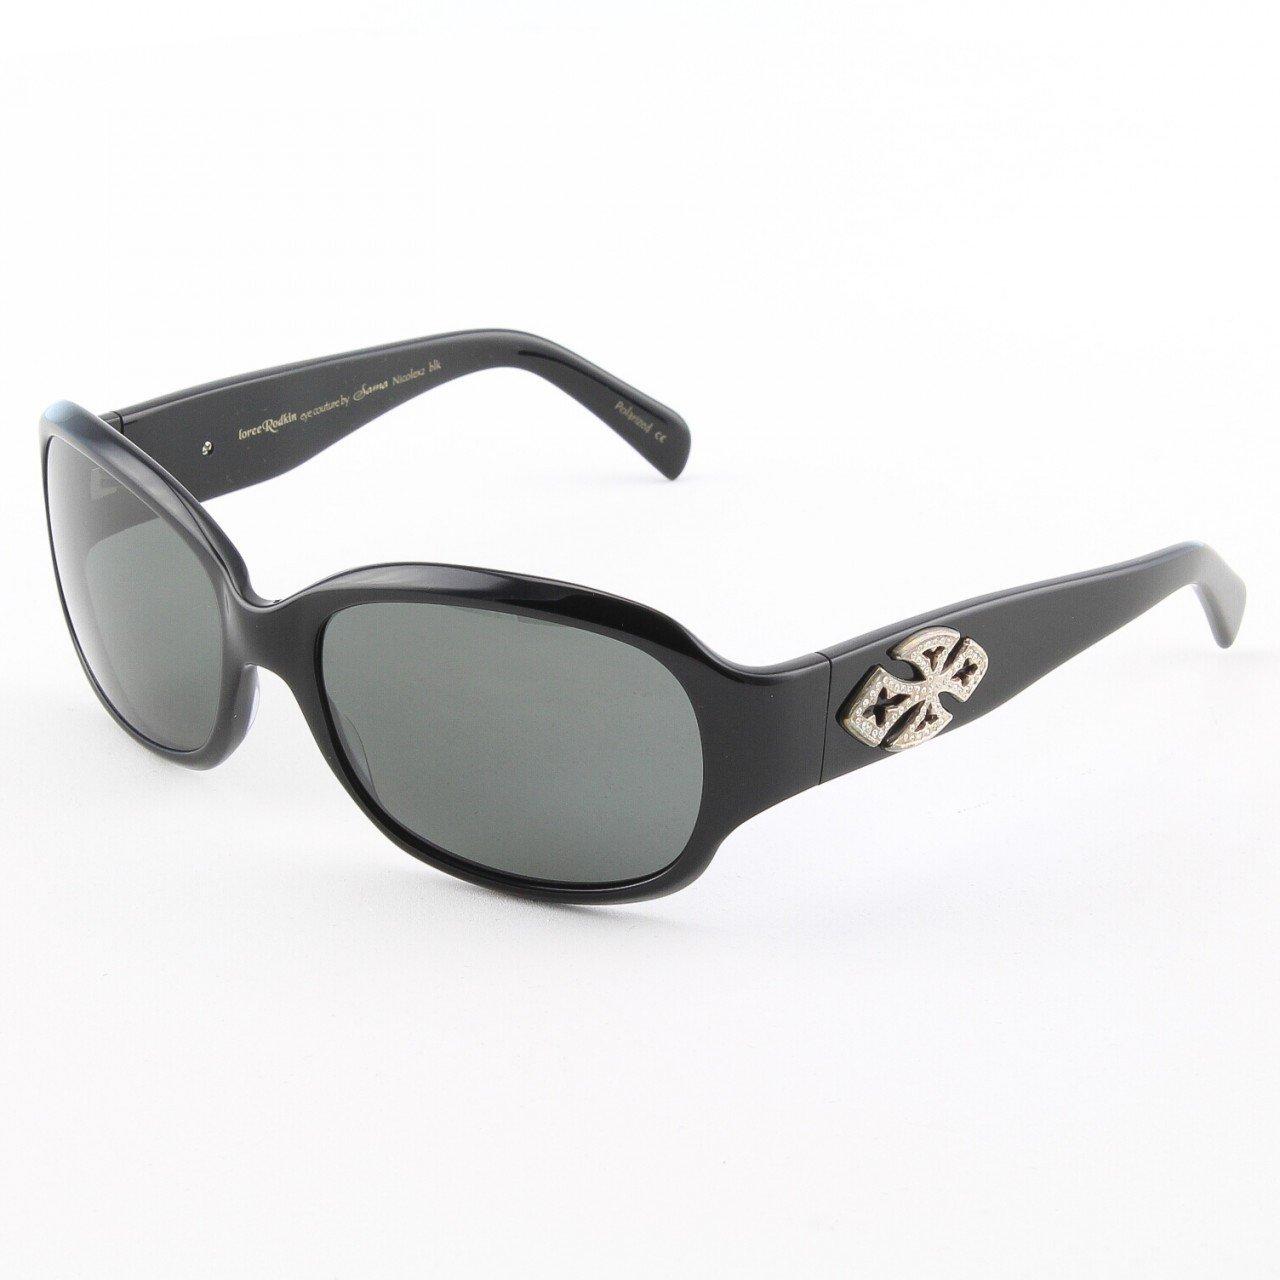 Loree Rodkin Nicole S2 Sunglasses Black w/ Polarized Lenses, Sterling Silver, Swarovski Crystals